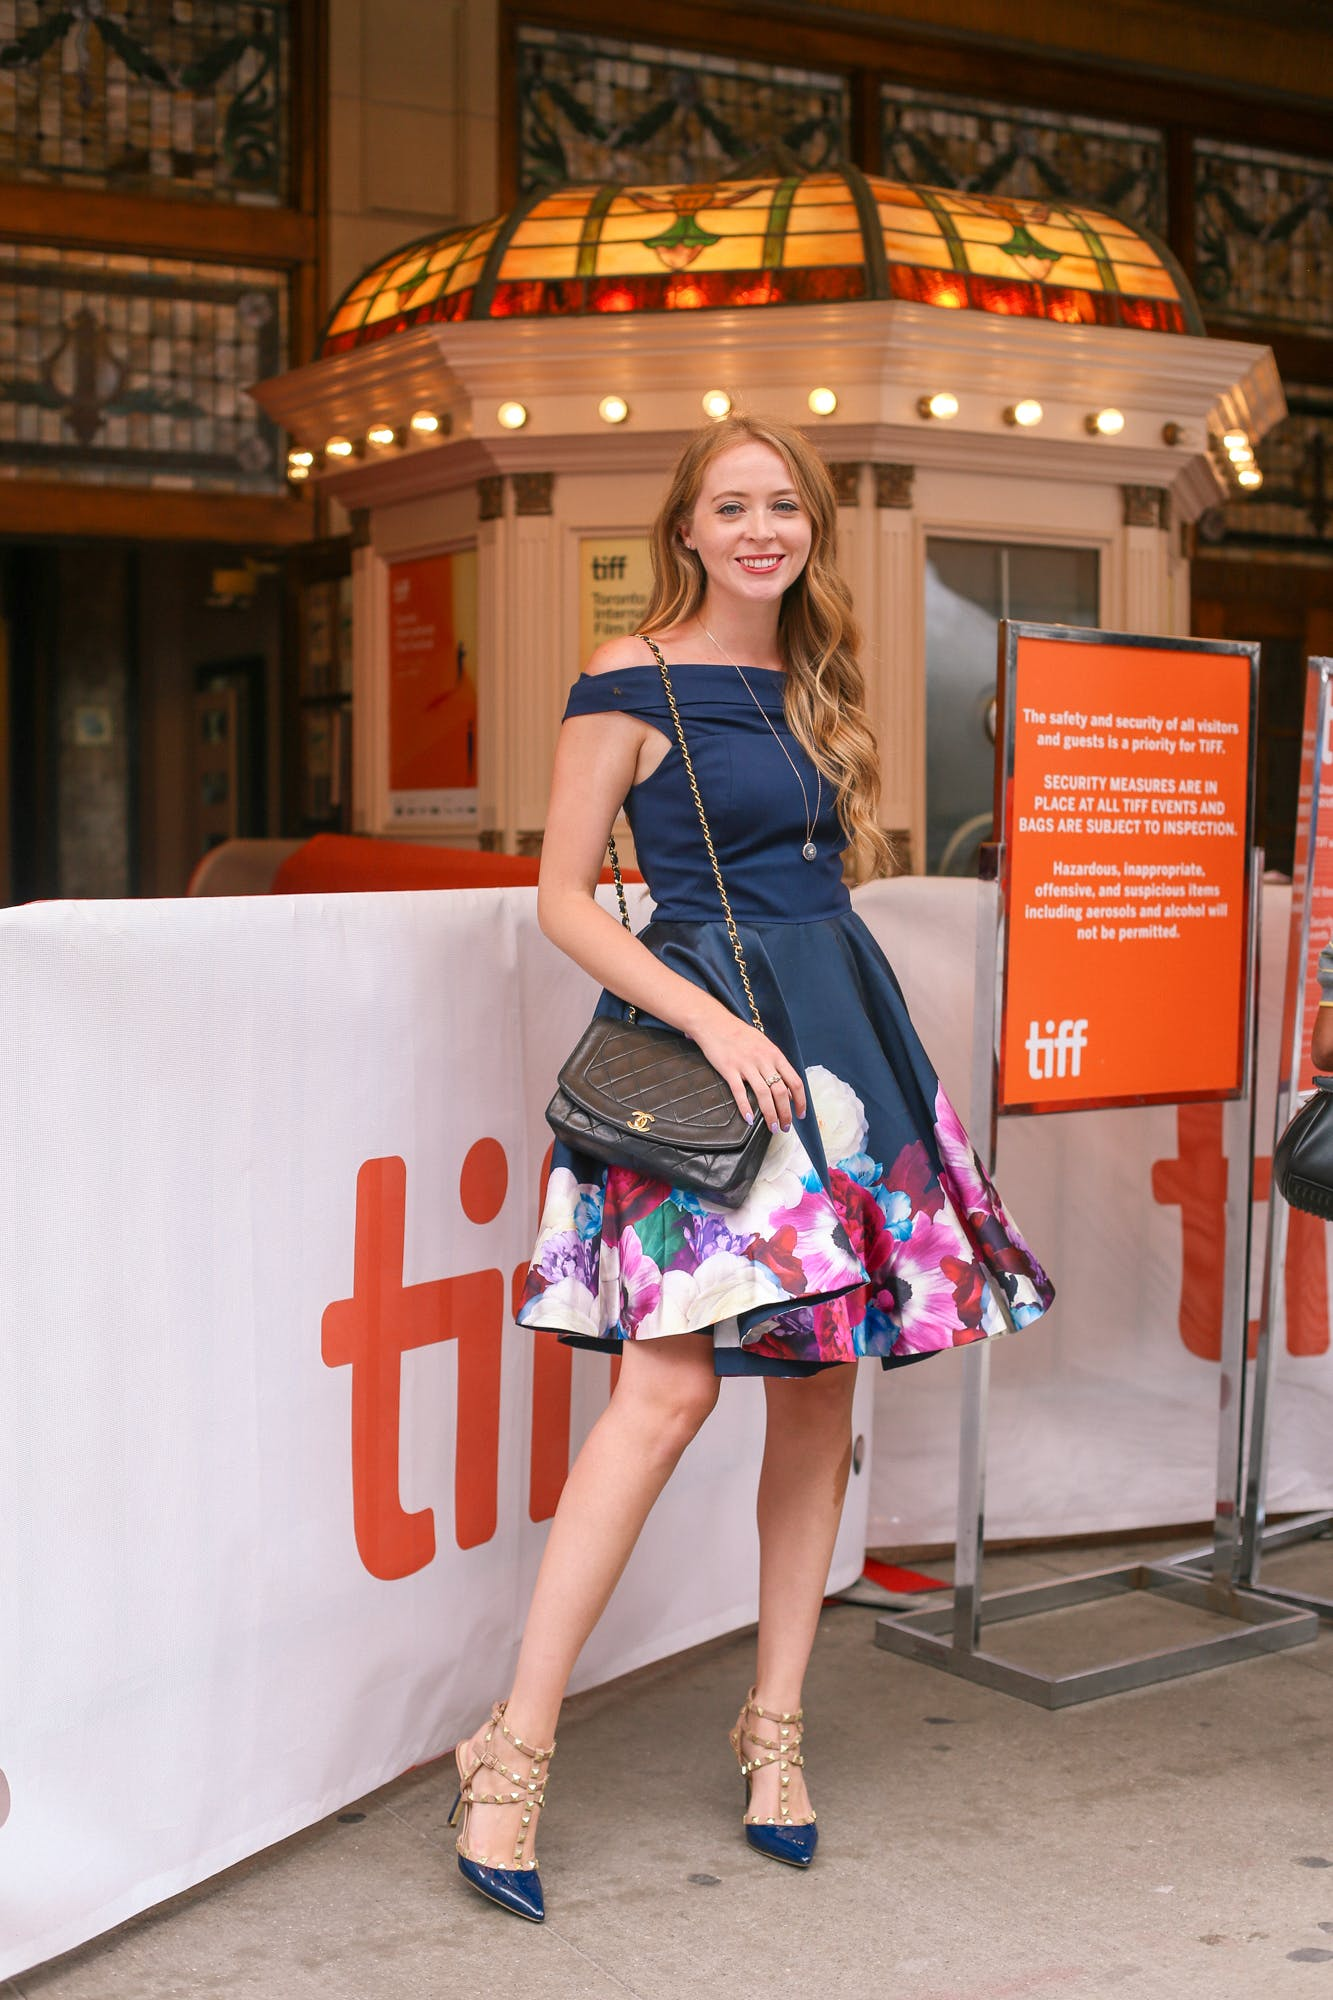 Ted Baker Blushing Bouquet Bardot Dress, Chanel Diana Bag, BCBG studded pumps